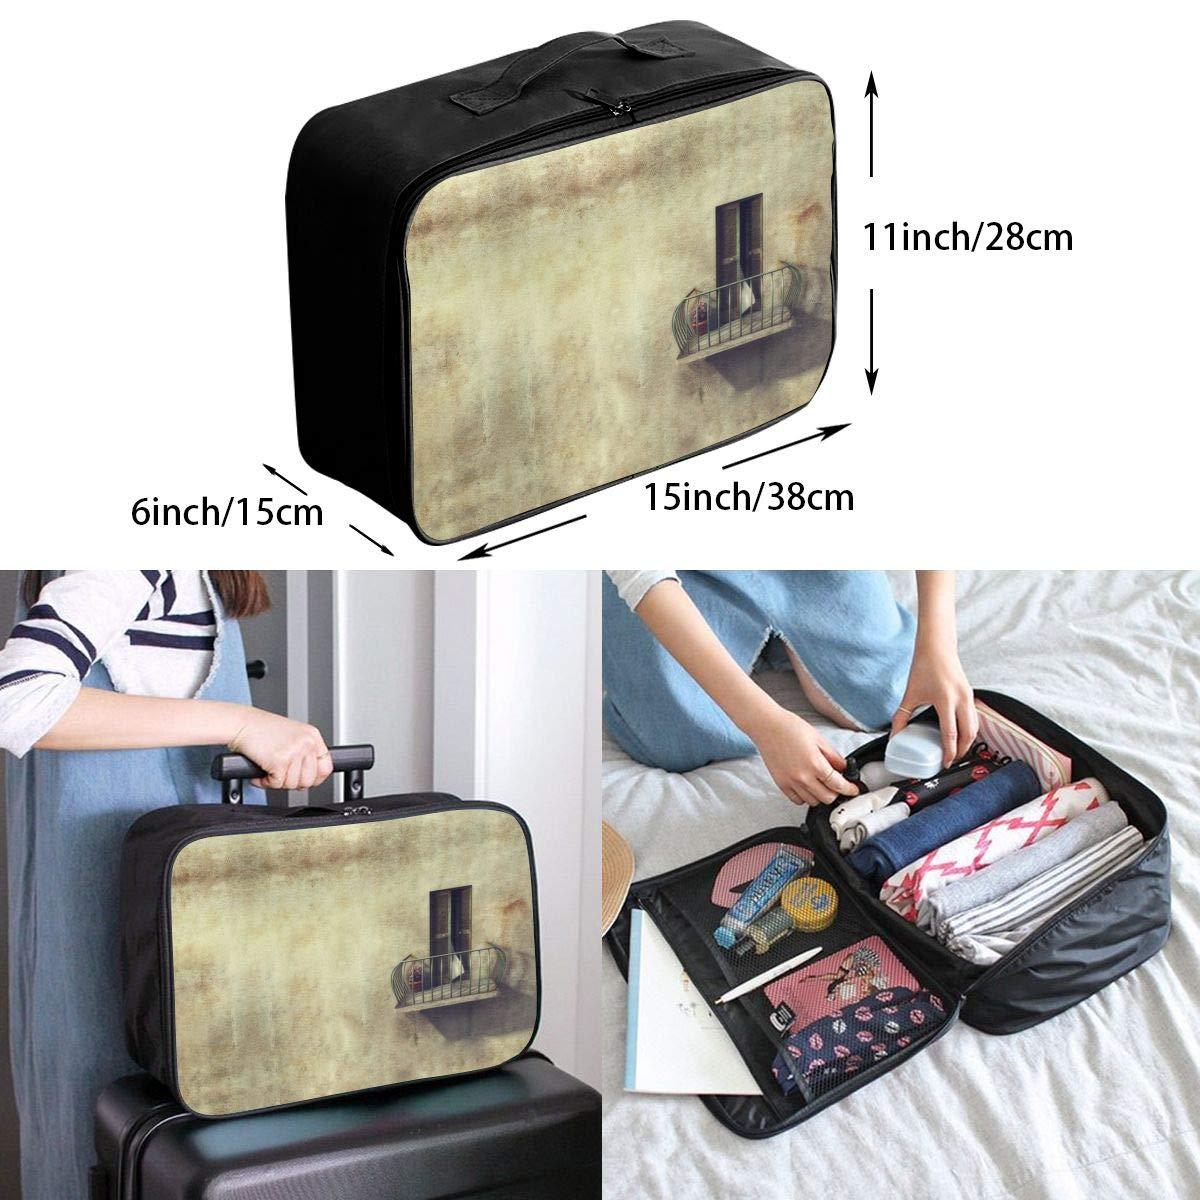 Travel Luggage Duffle Bag Lightweight Portable Handbag Retro Door Print Large Capacity Waterproof Foldable Storage Tote